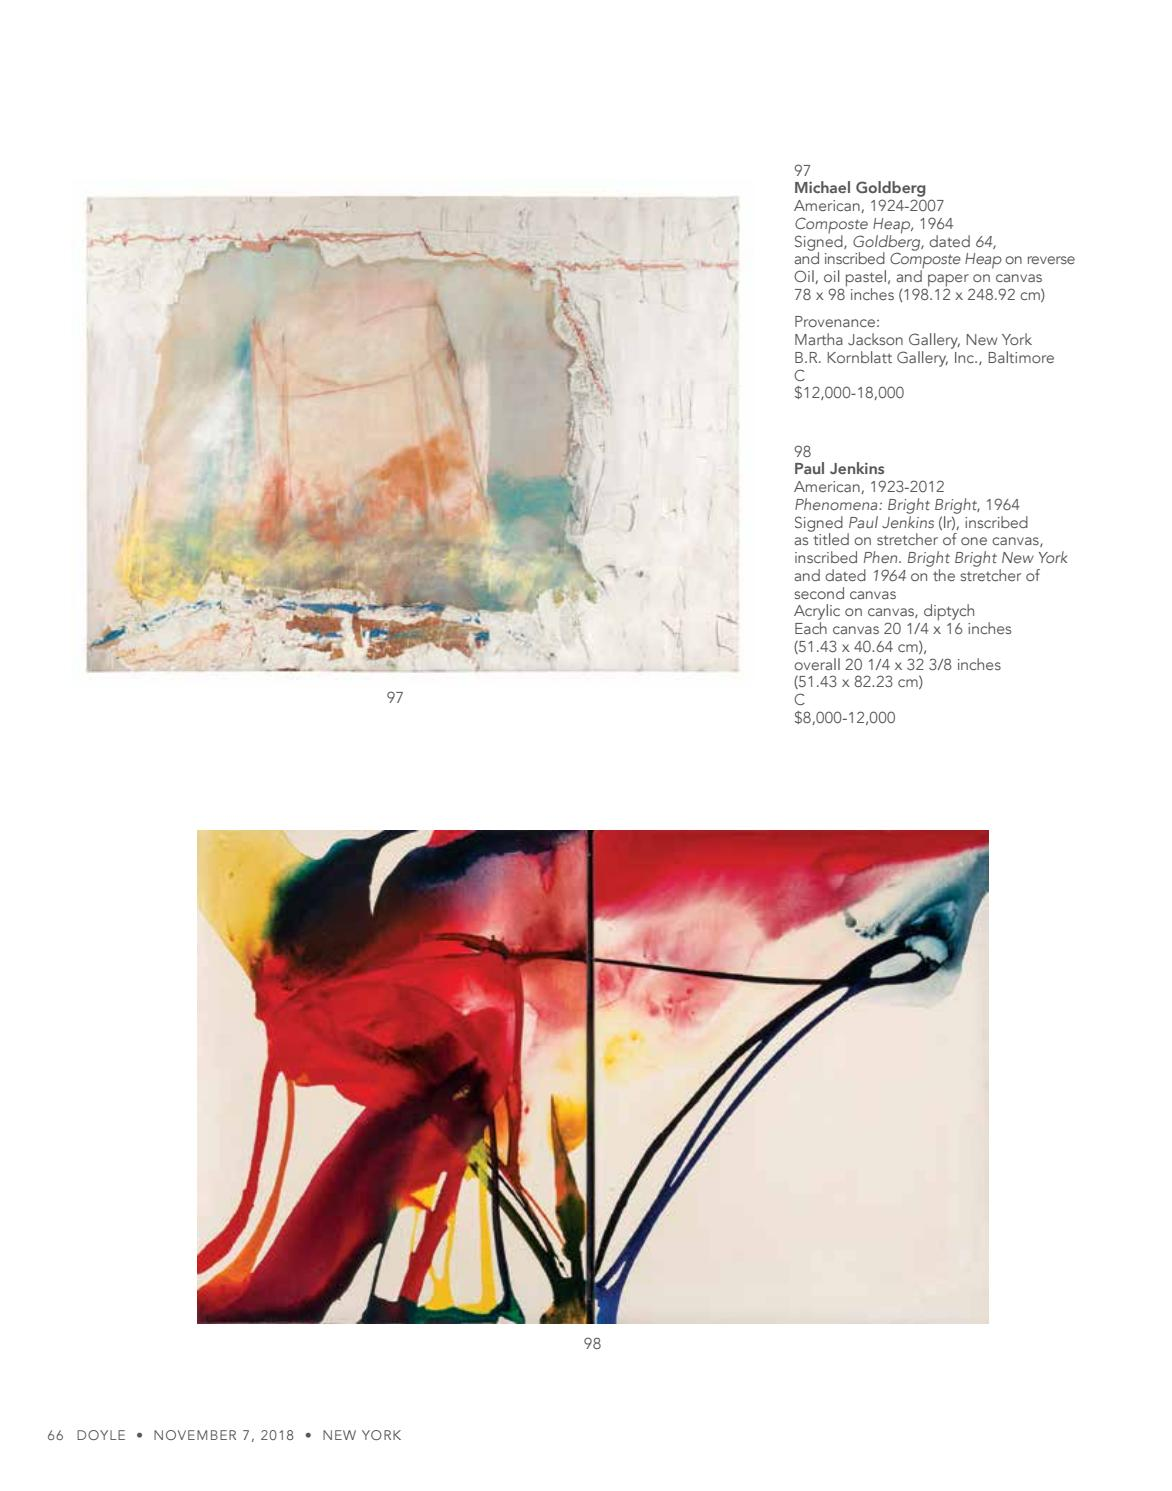 Impressionist & Modern Art / Post-War & Contemporary Art 11 7 18 by